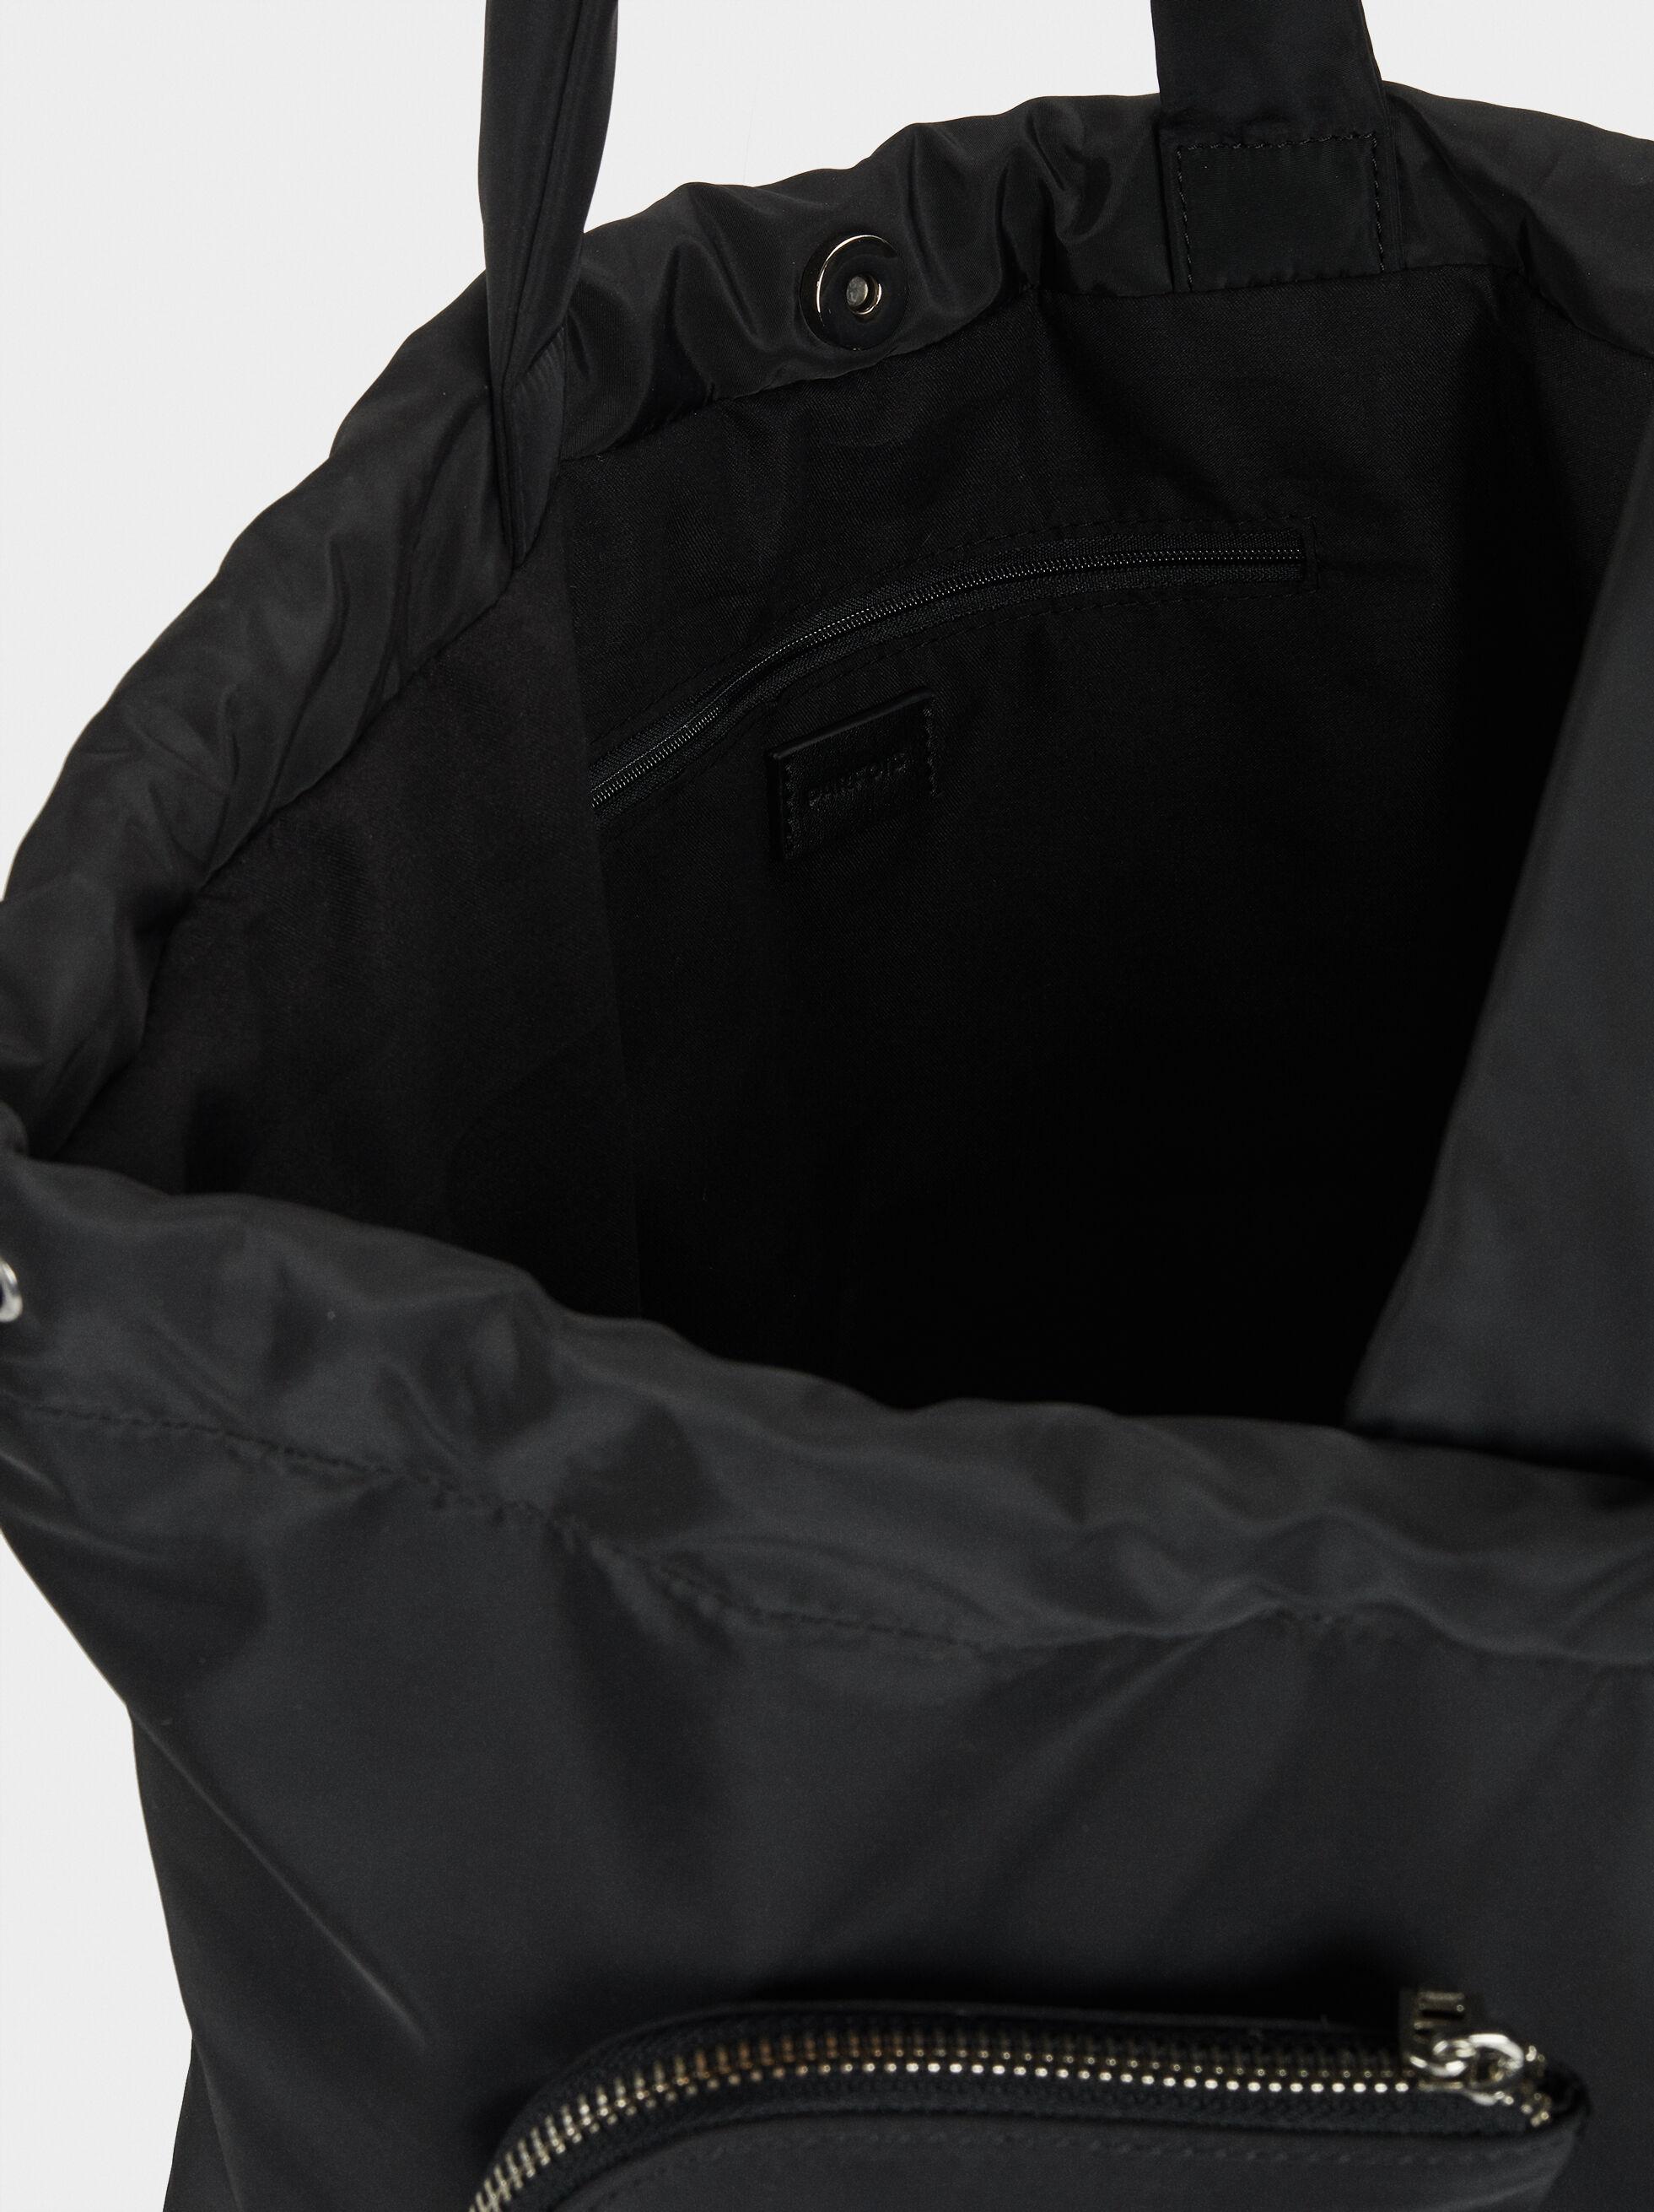 Nylon Tote Bag With Removable Pockets, Black, hi-res